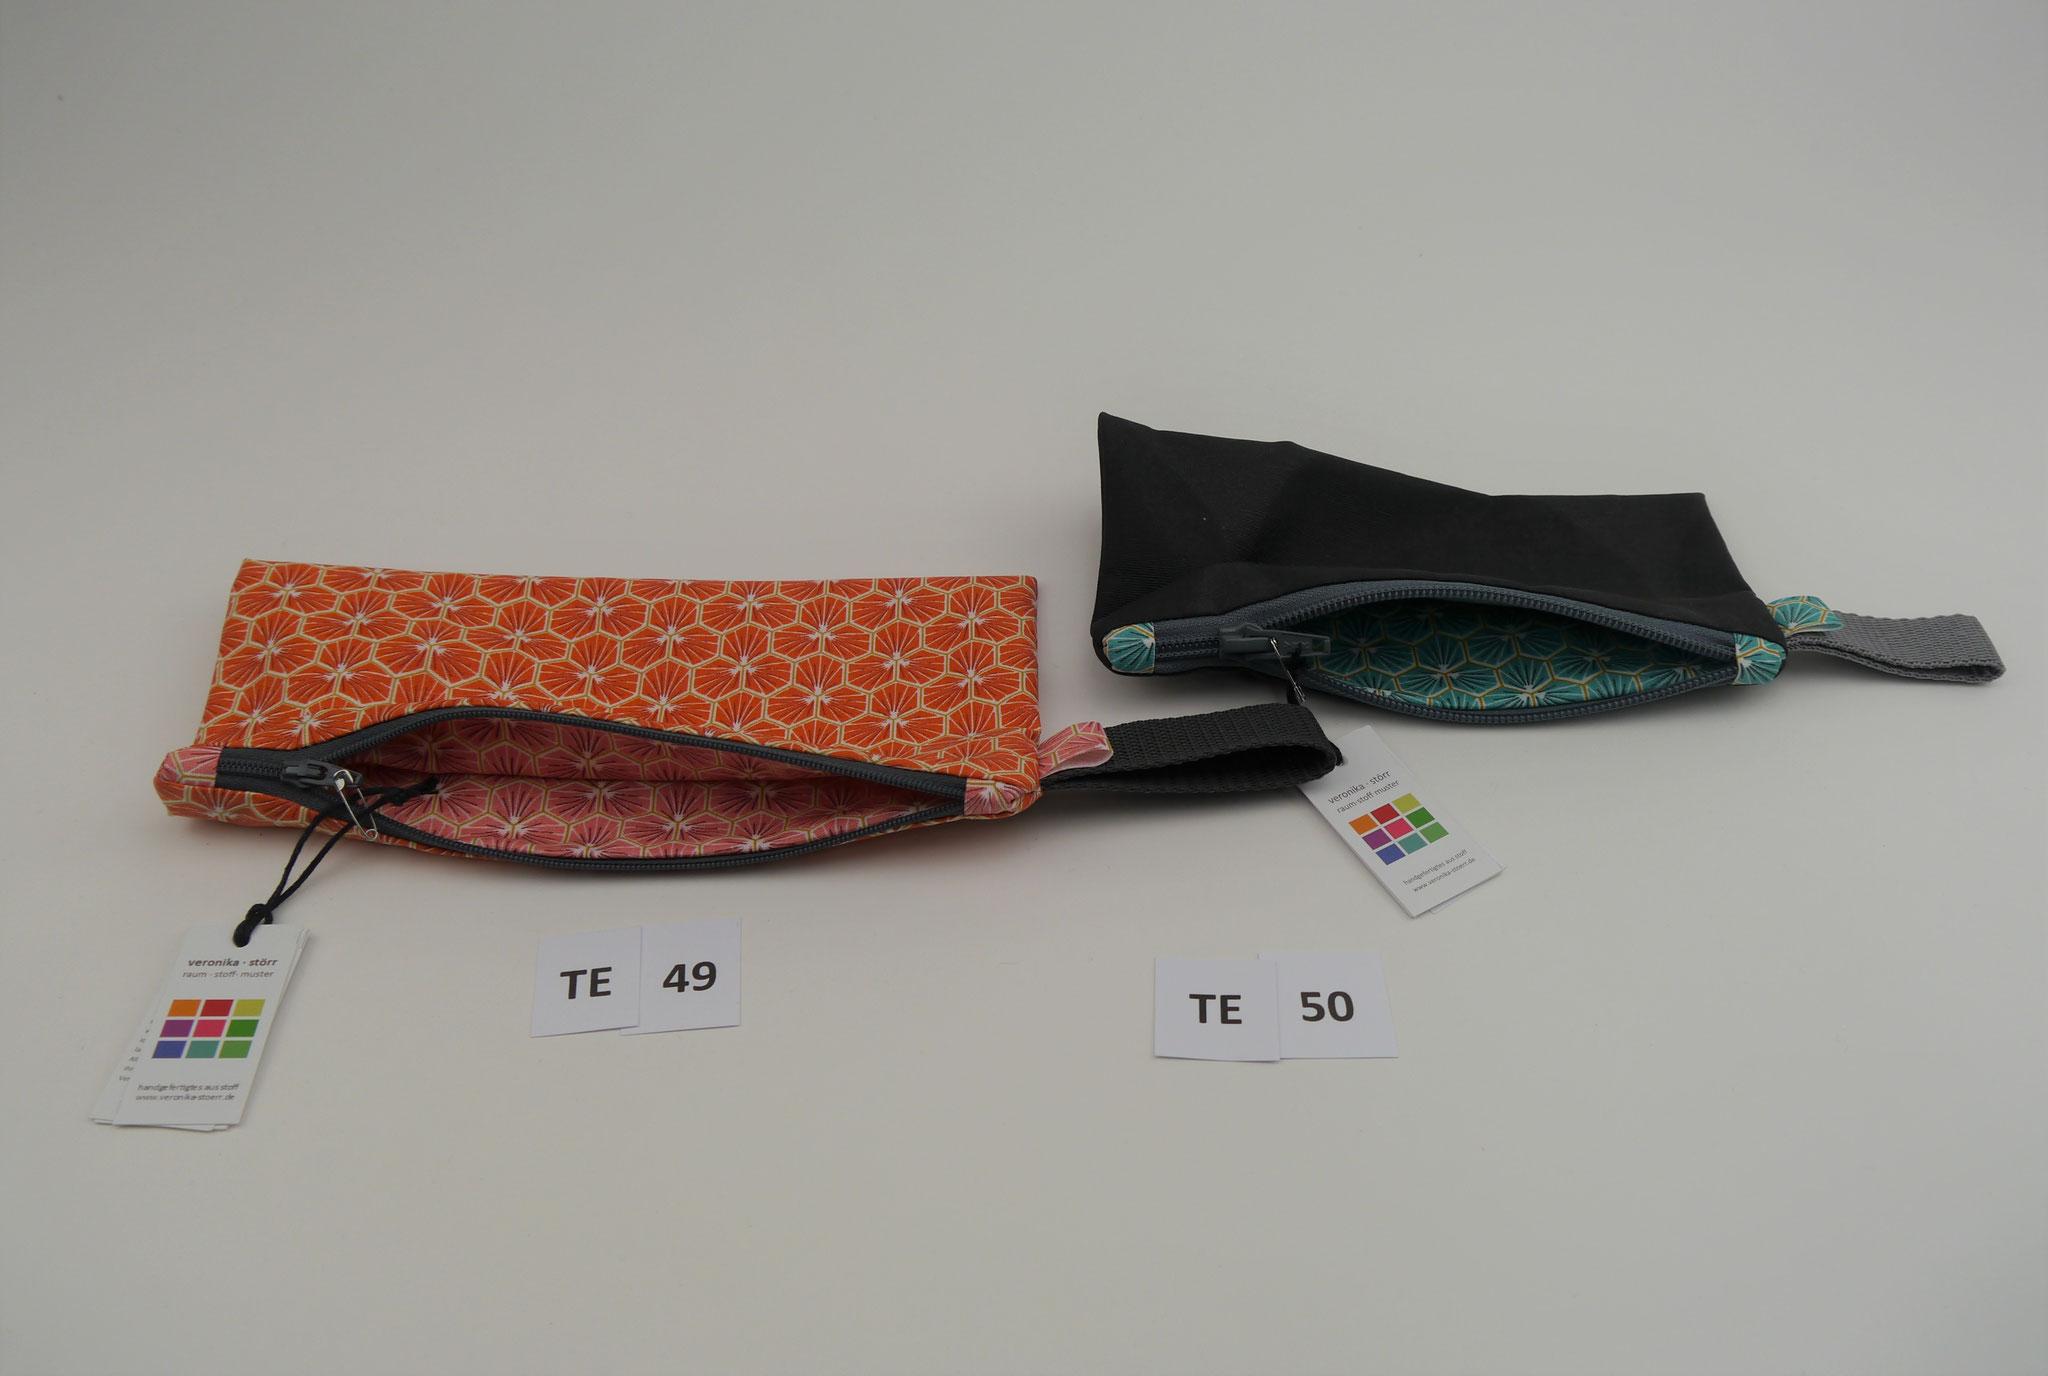 TE1 : 22 x 10 cm * AS + IS: besch BW * 13,90 €   #    TE 50 : 18,5 x 9 cm * AS + IS: besch BW * 12,90 €